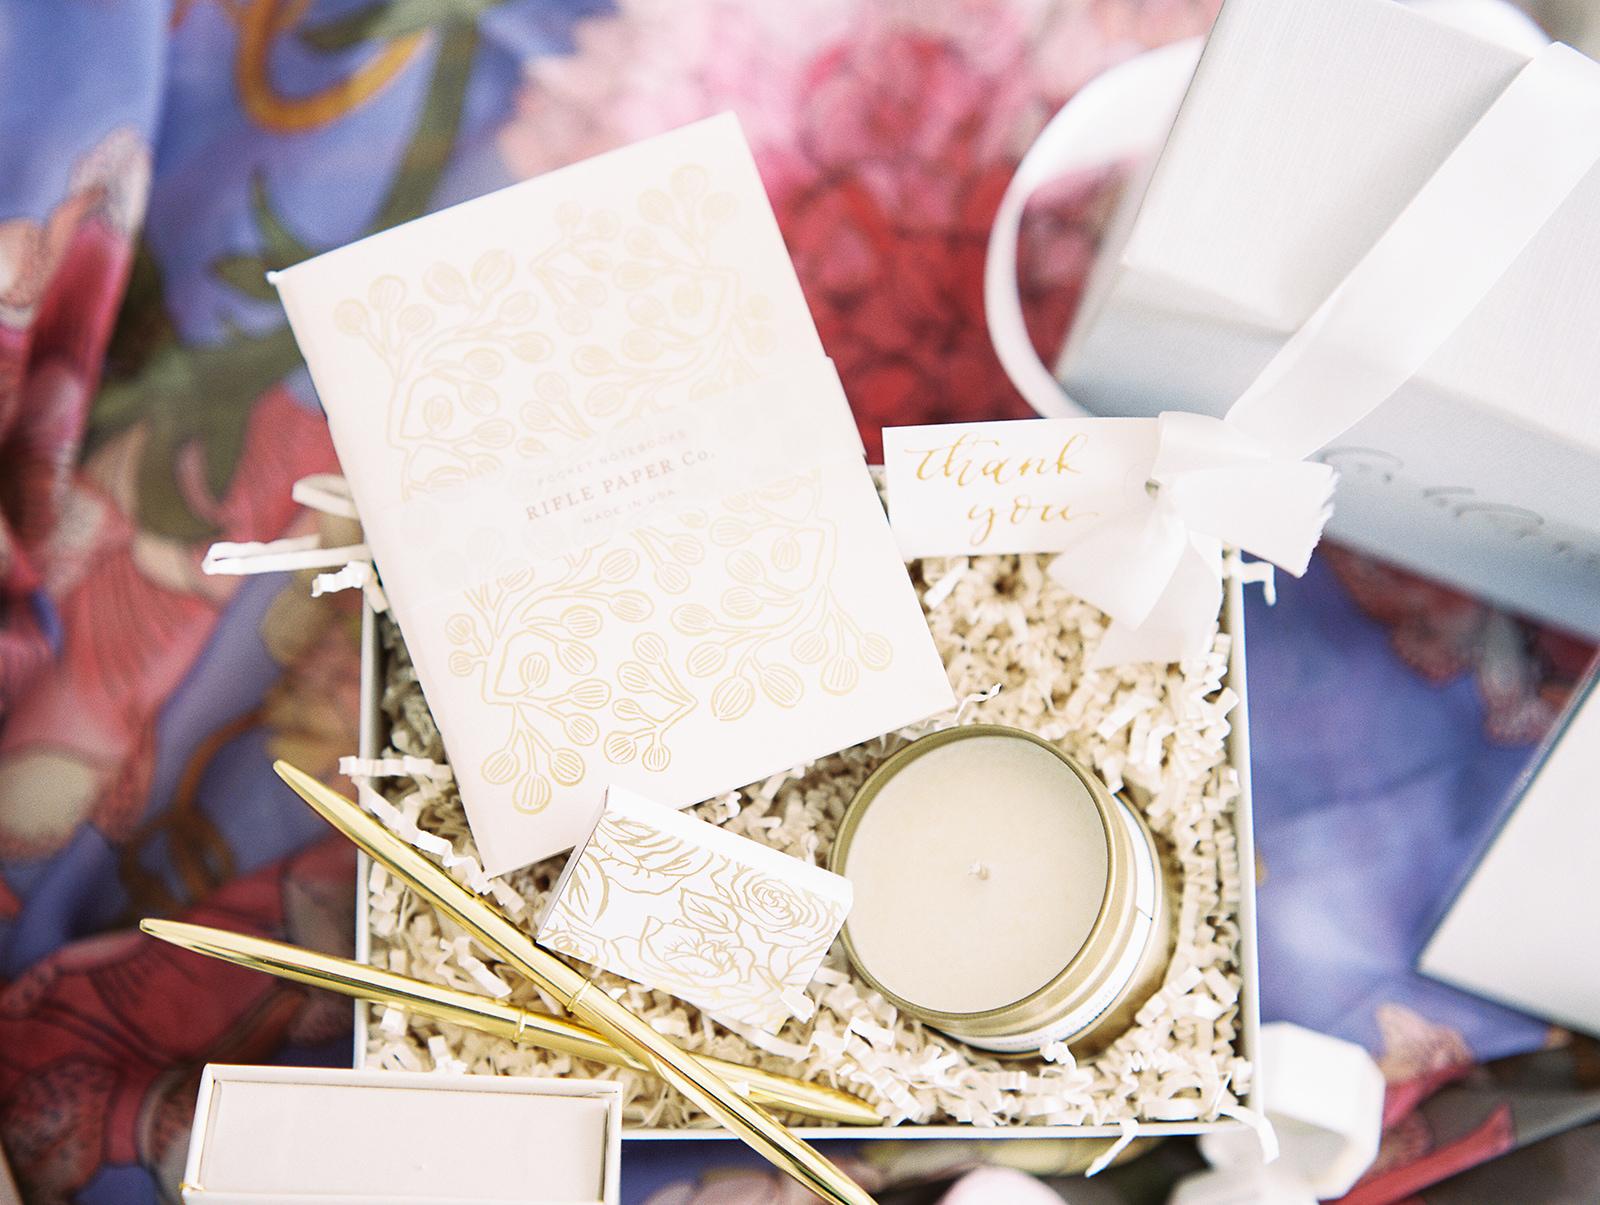 Gift box from  Foxblossom .